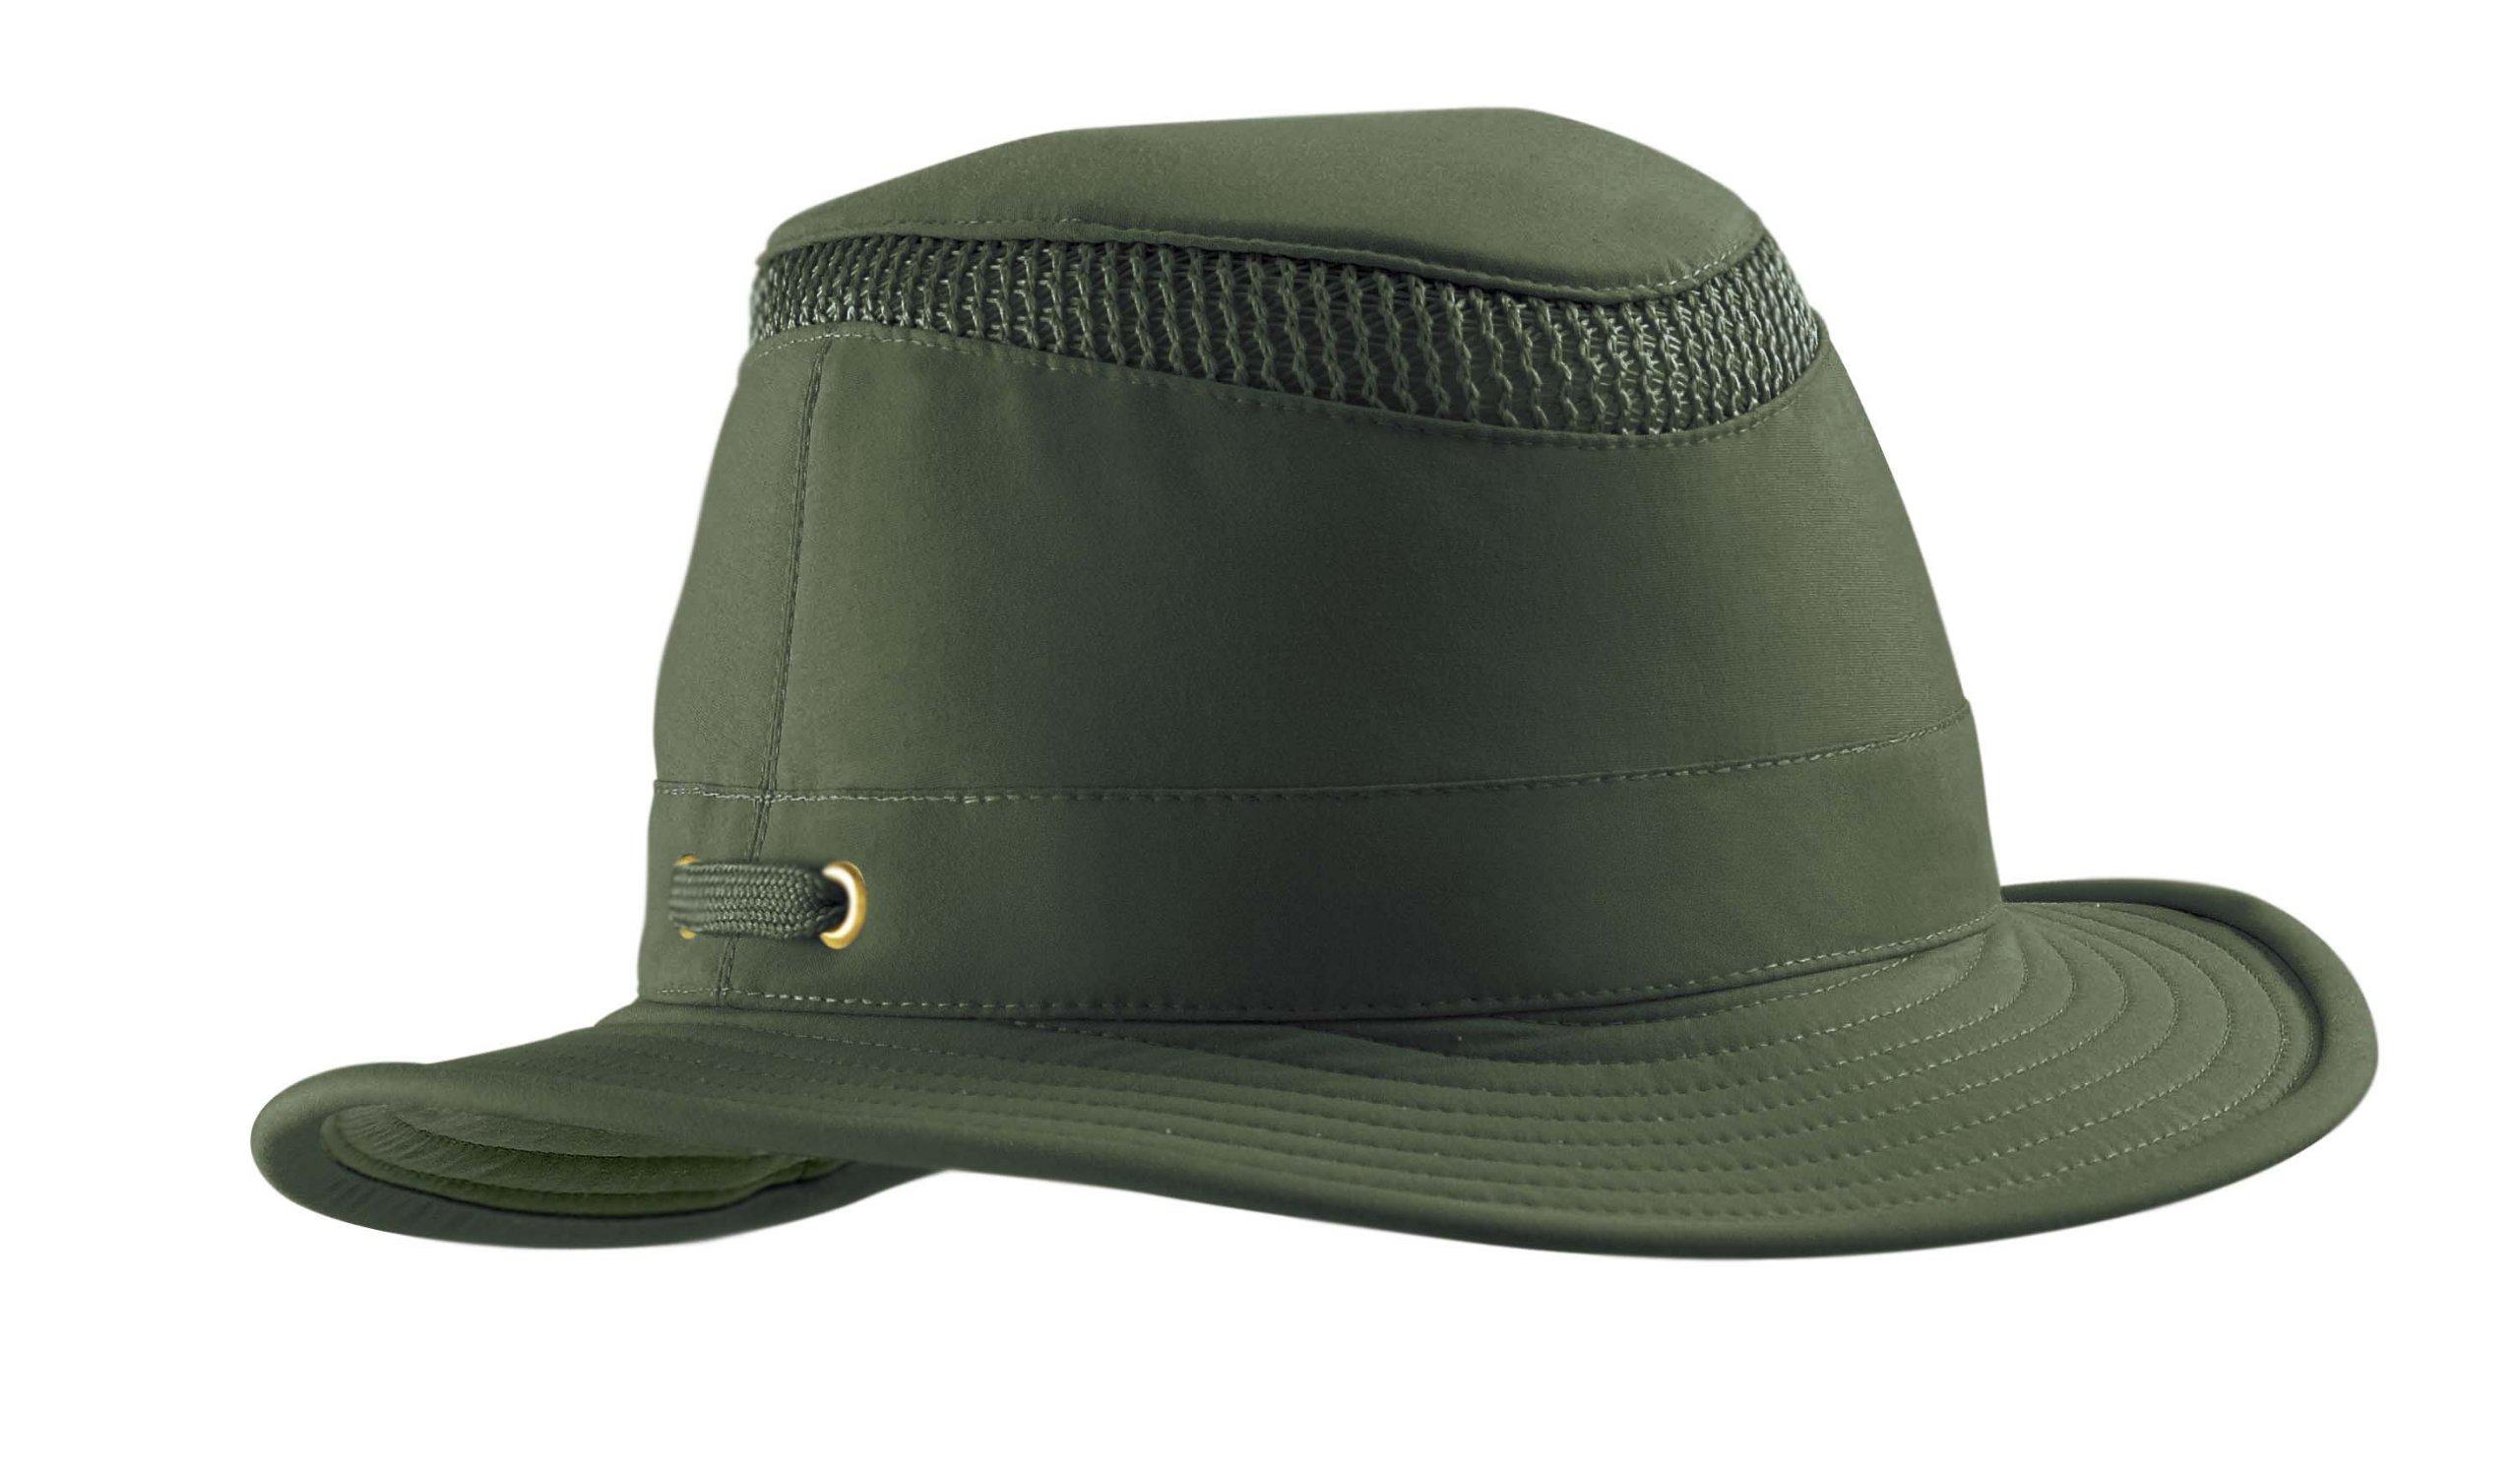 Tilley Unisex Adult LTM5 Airflo Hat,Olive,8+